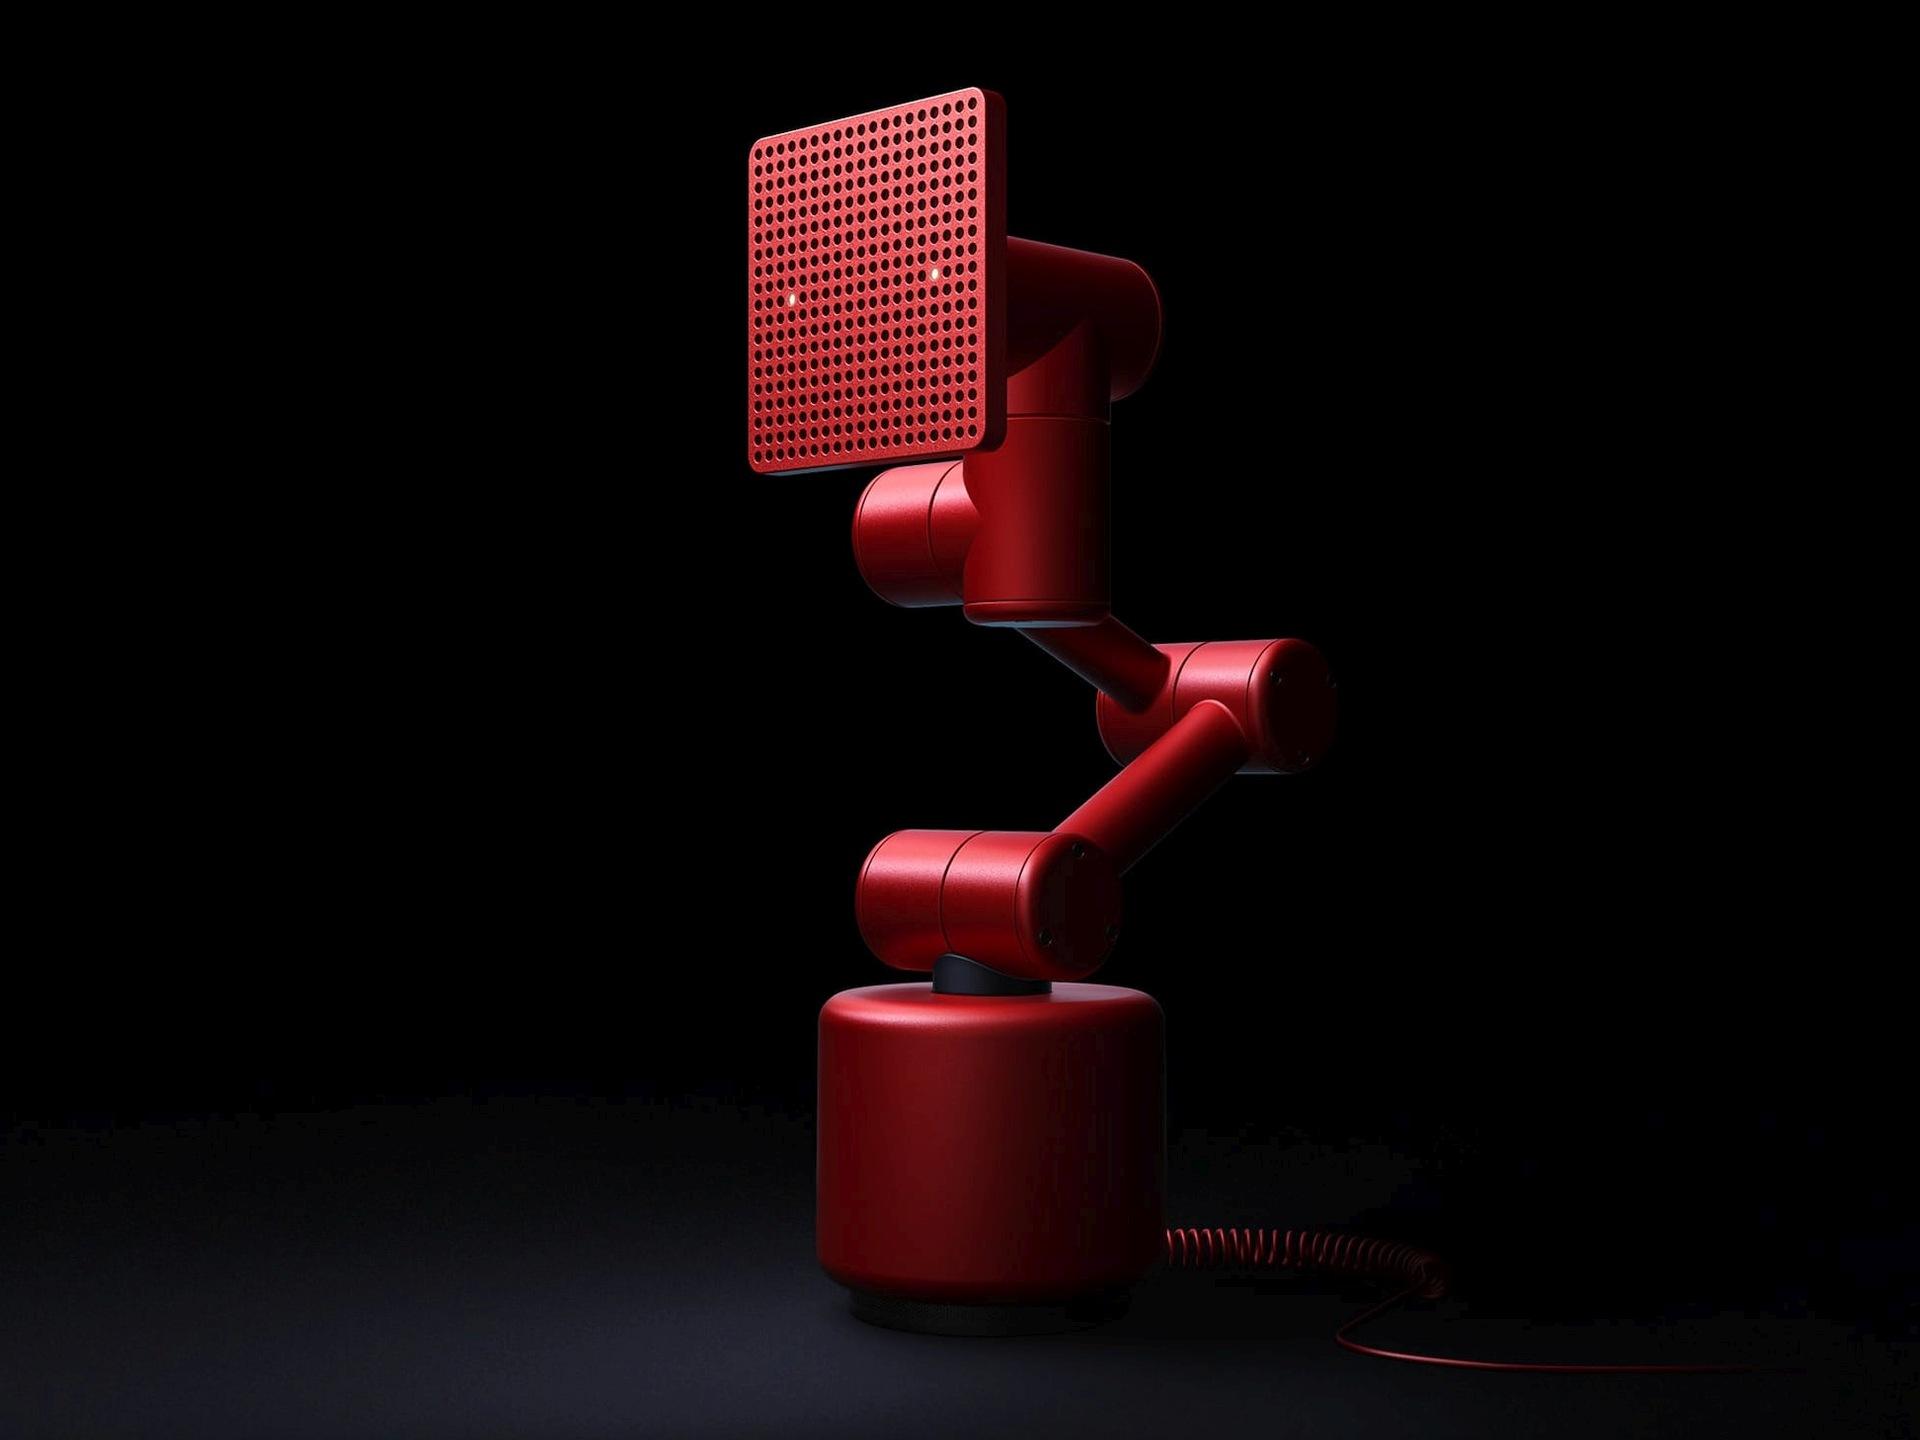 Танцующий робот помощник от Baidu